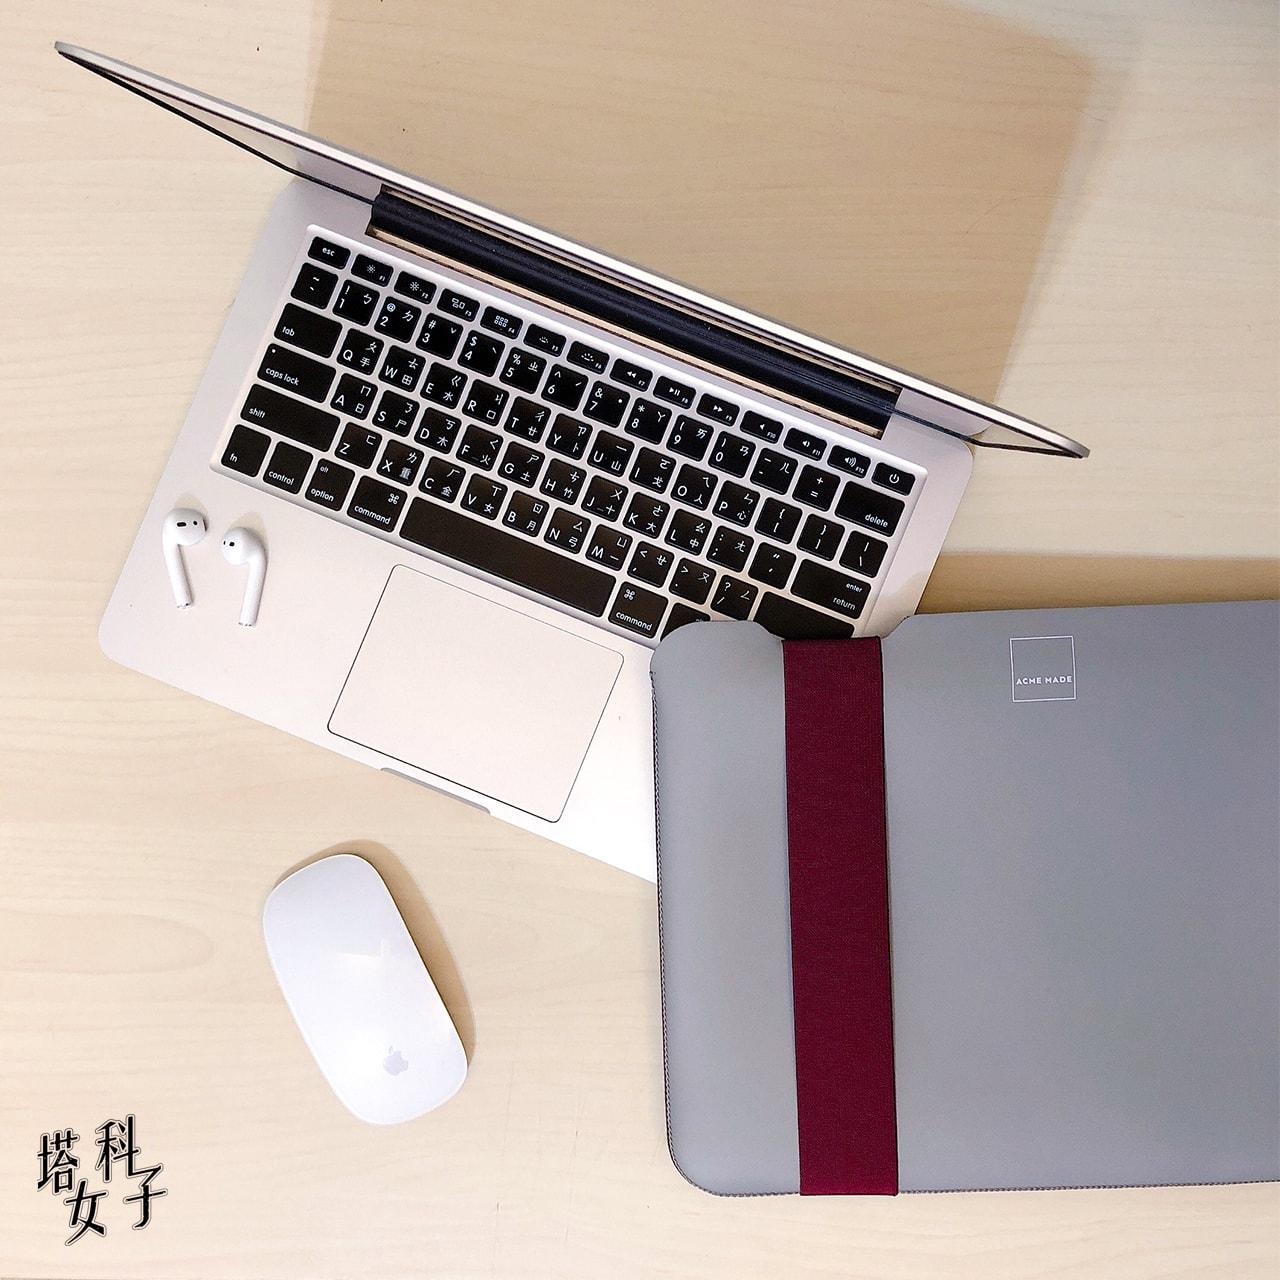 MacBook Pro/Air 保護套推薦 - Acme Made - Skinny Sleeve